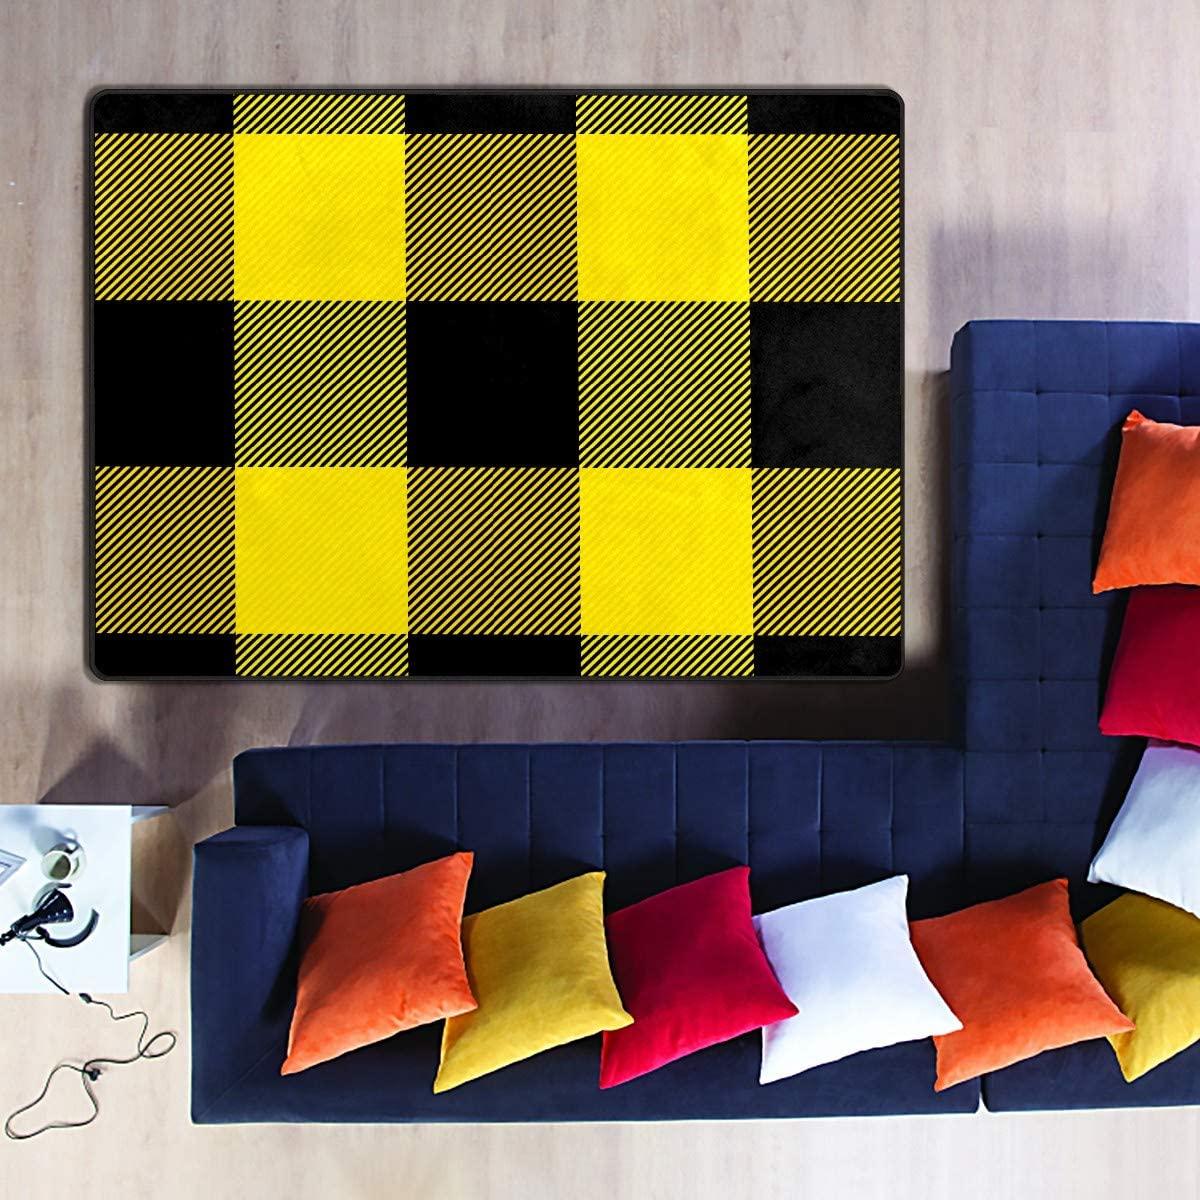 Yellow Black Plaid Pattern 5'3''x4' Soft Area Rugs Kitchen Rugs Rectangle Velvet Carpet Multifunction Floor Mats for Bedroom Living Room Home Decor Office